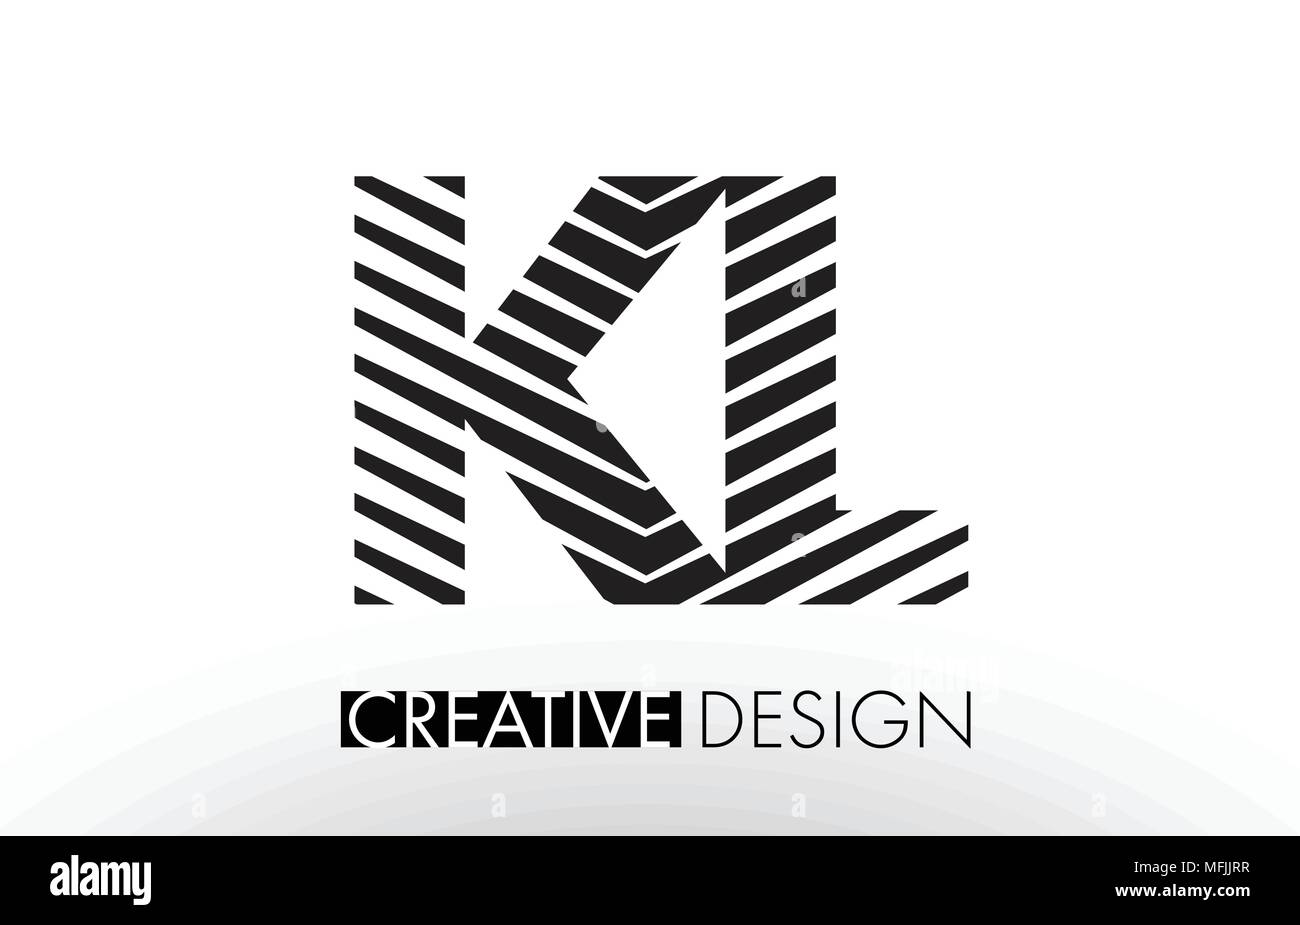 KL K L Lines Letter Design with Creative Elegant Zebra Vector Illustration. - Stock Vector